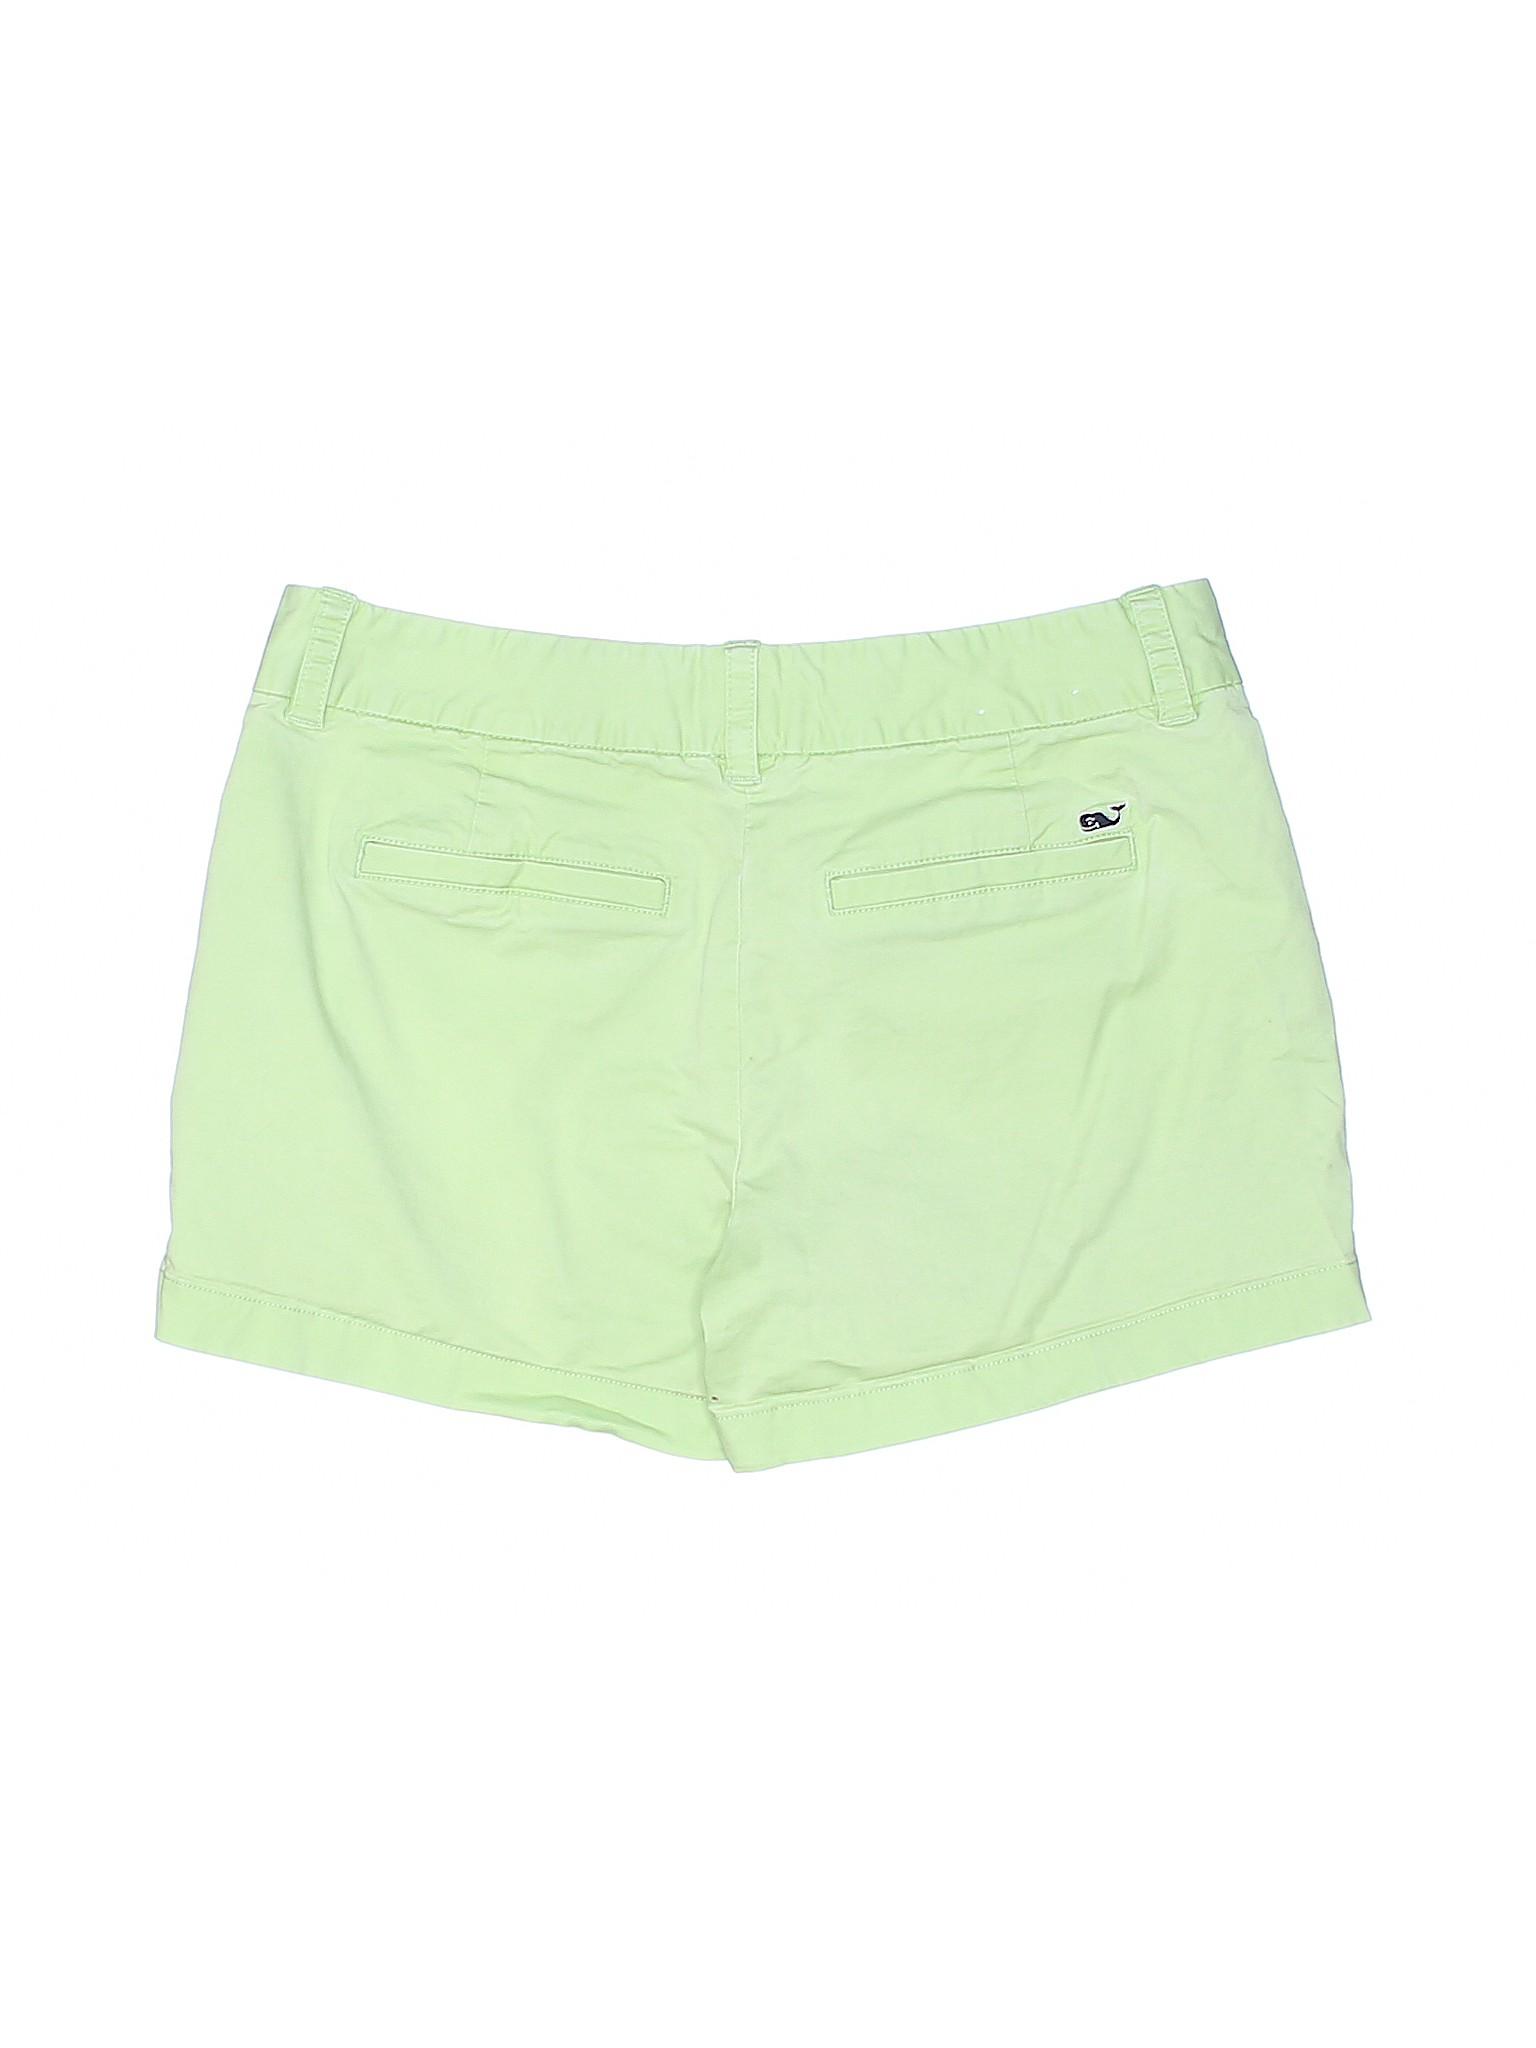 Khaki Vines leisure Shorts Boutique Vineyard Zgxq4SwR